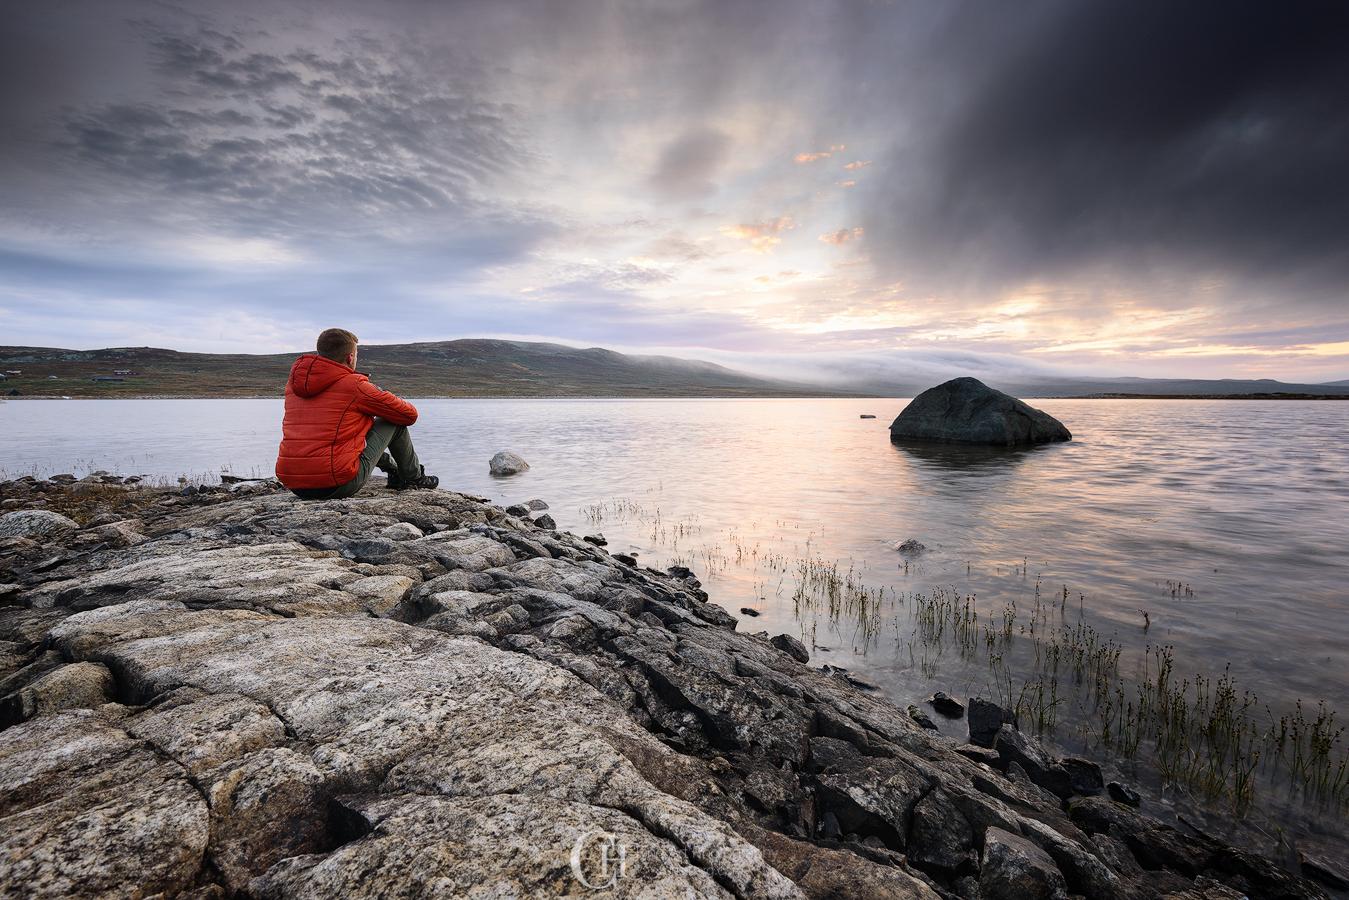 Enjoying a sunrise on Hardangervidda in solitude